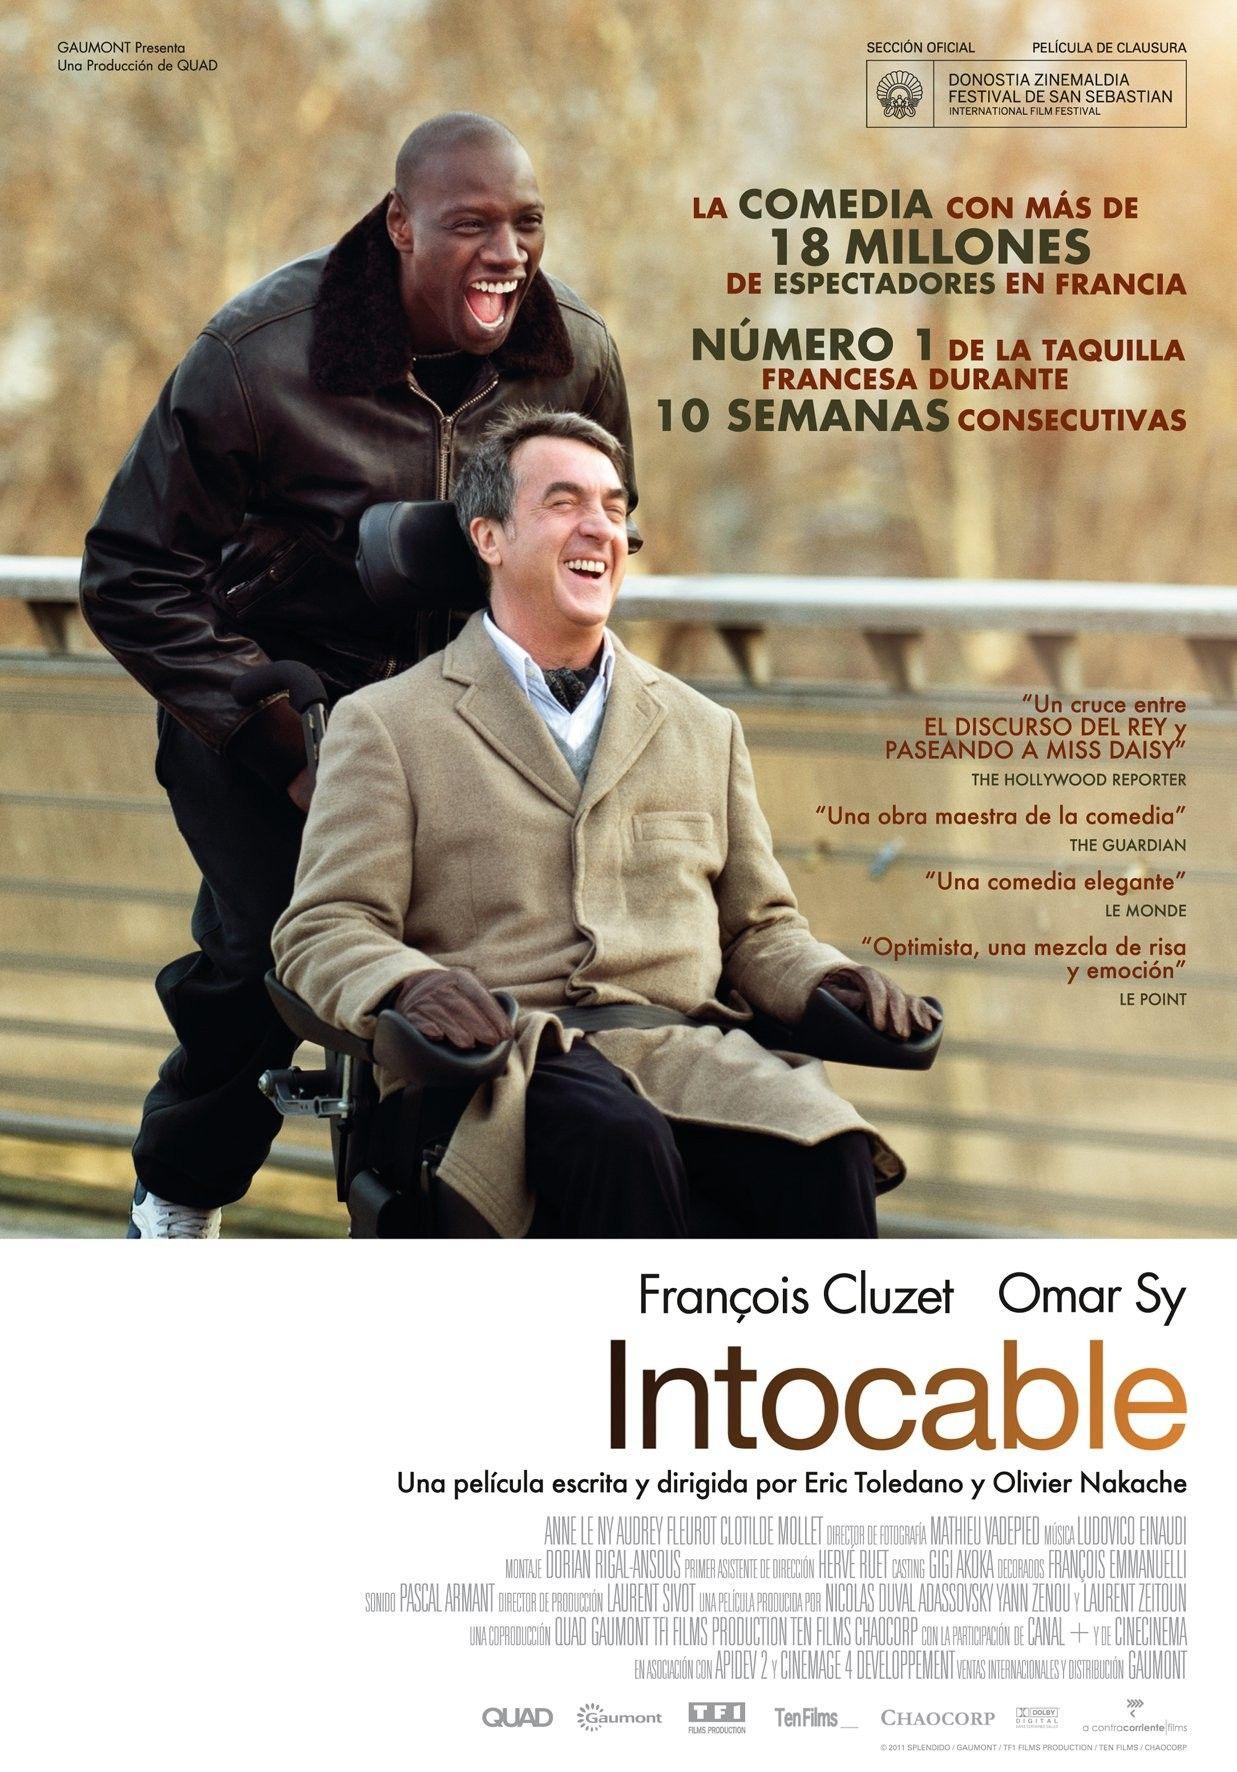 Ver Intocable Online Gratis 2011 Hd Pelicula Completa Espanol The Intouchables Film Movie Film Books